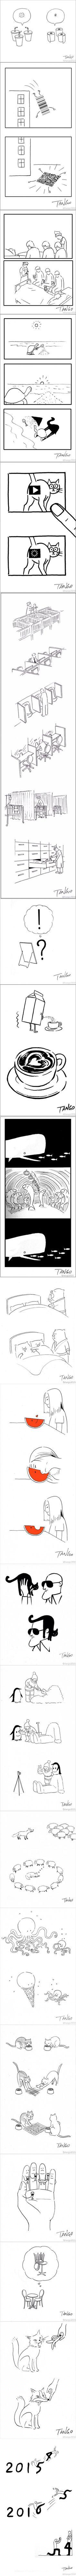 Funny minimalist comic strips                                                                                                                                                                                 More